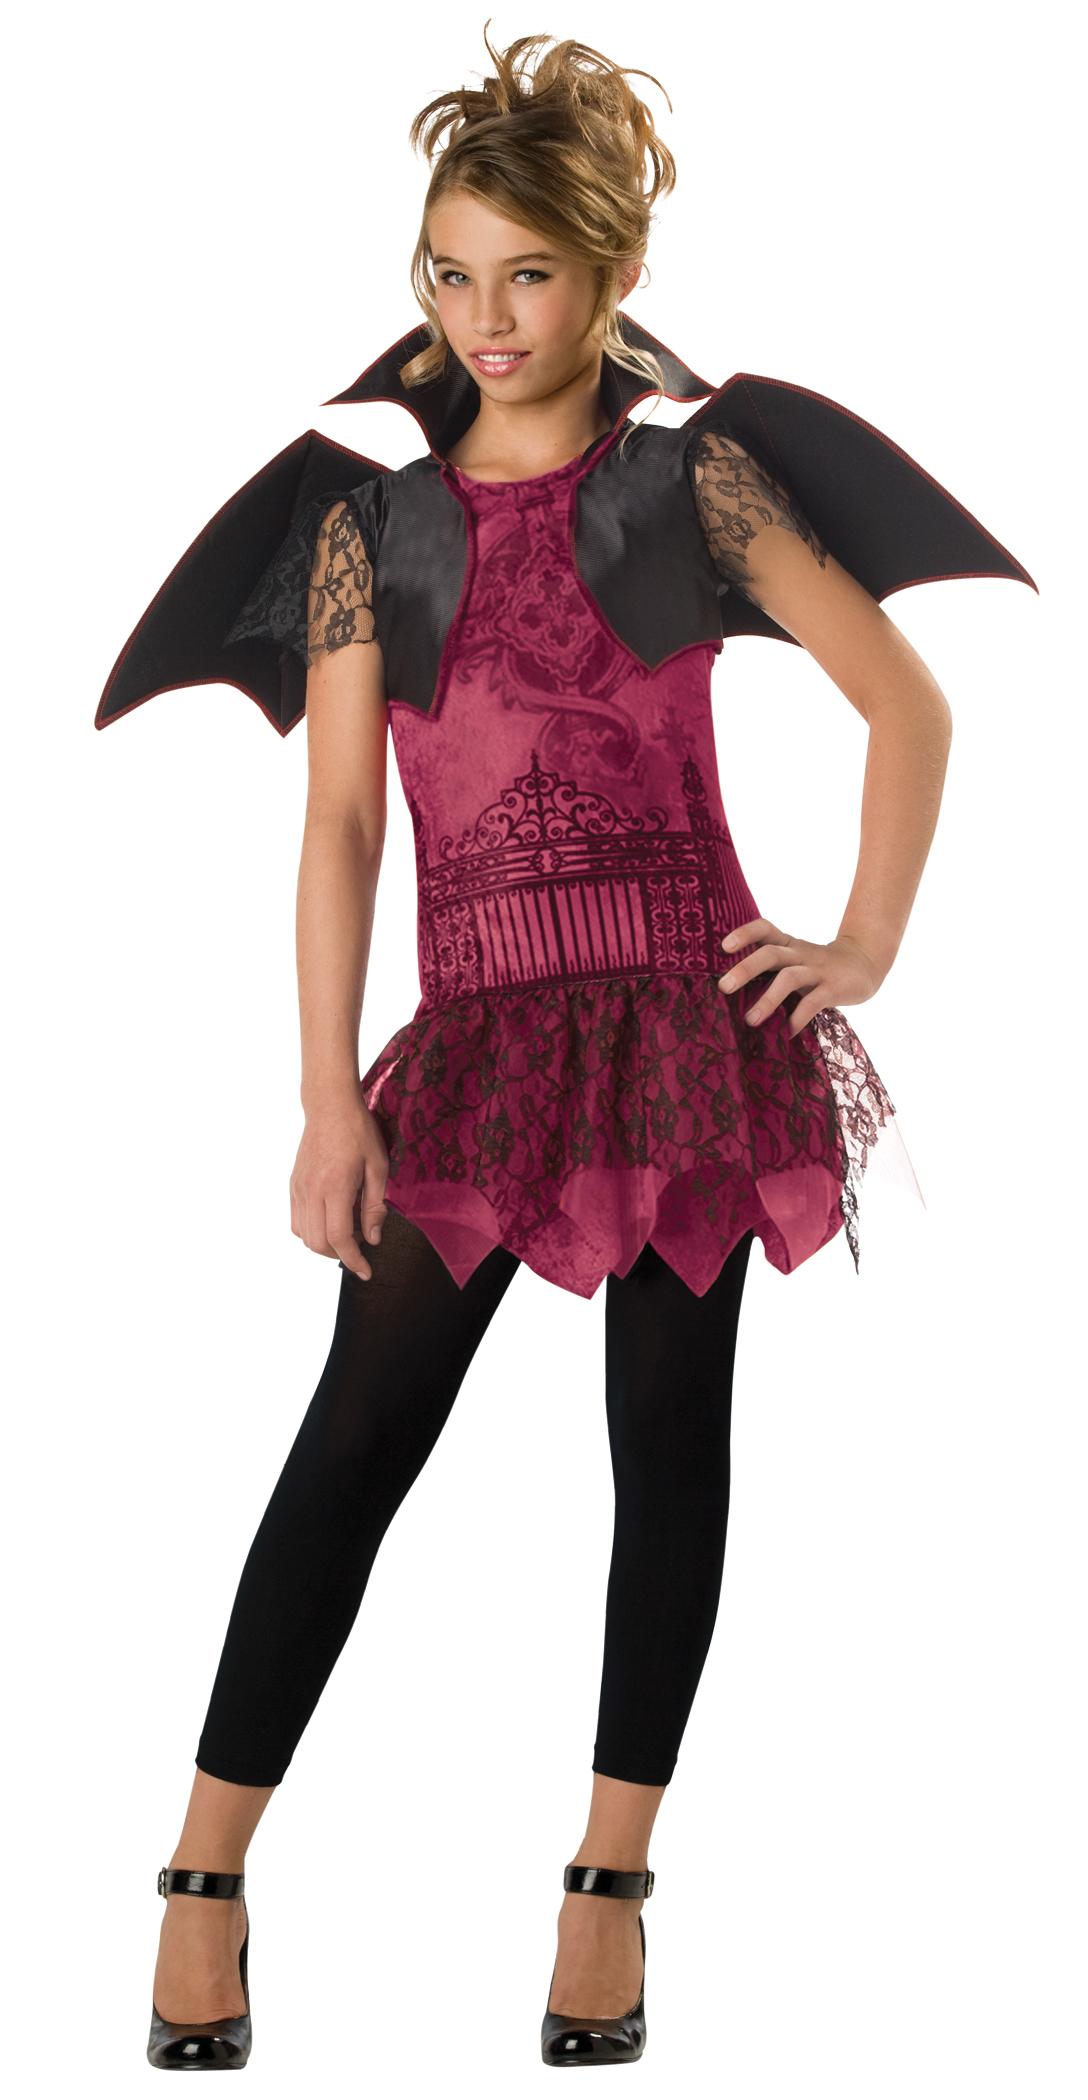 Новогодний костюм своими руками для девочки подростка